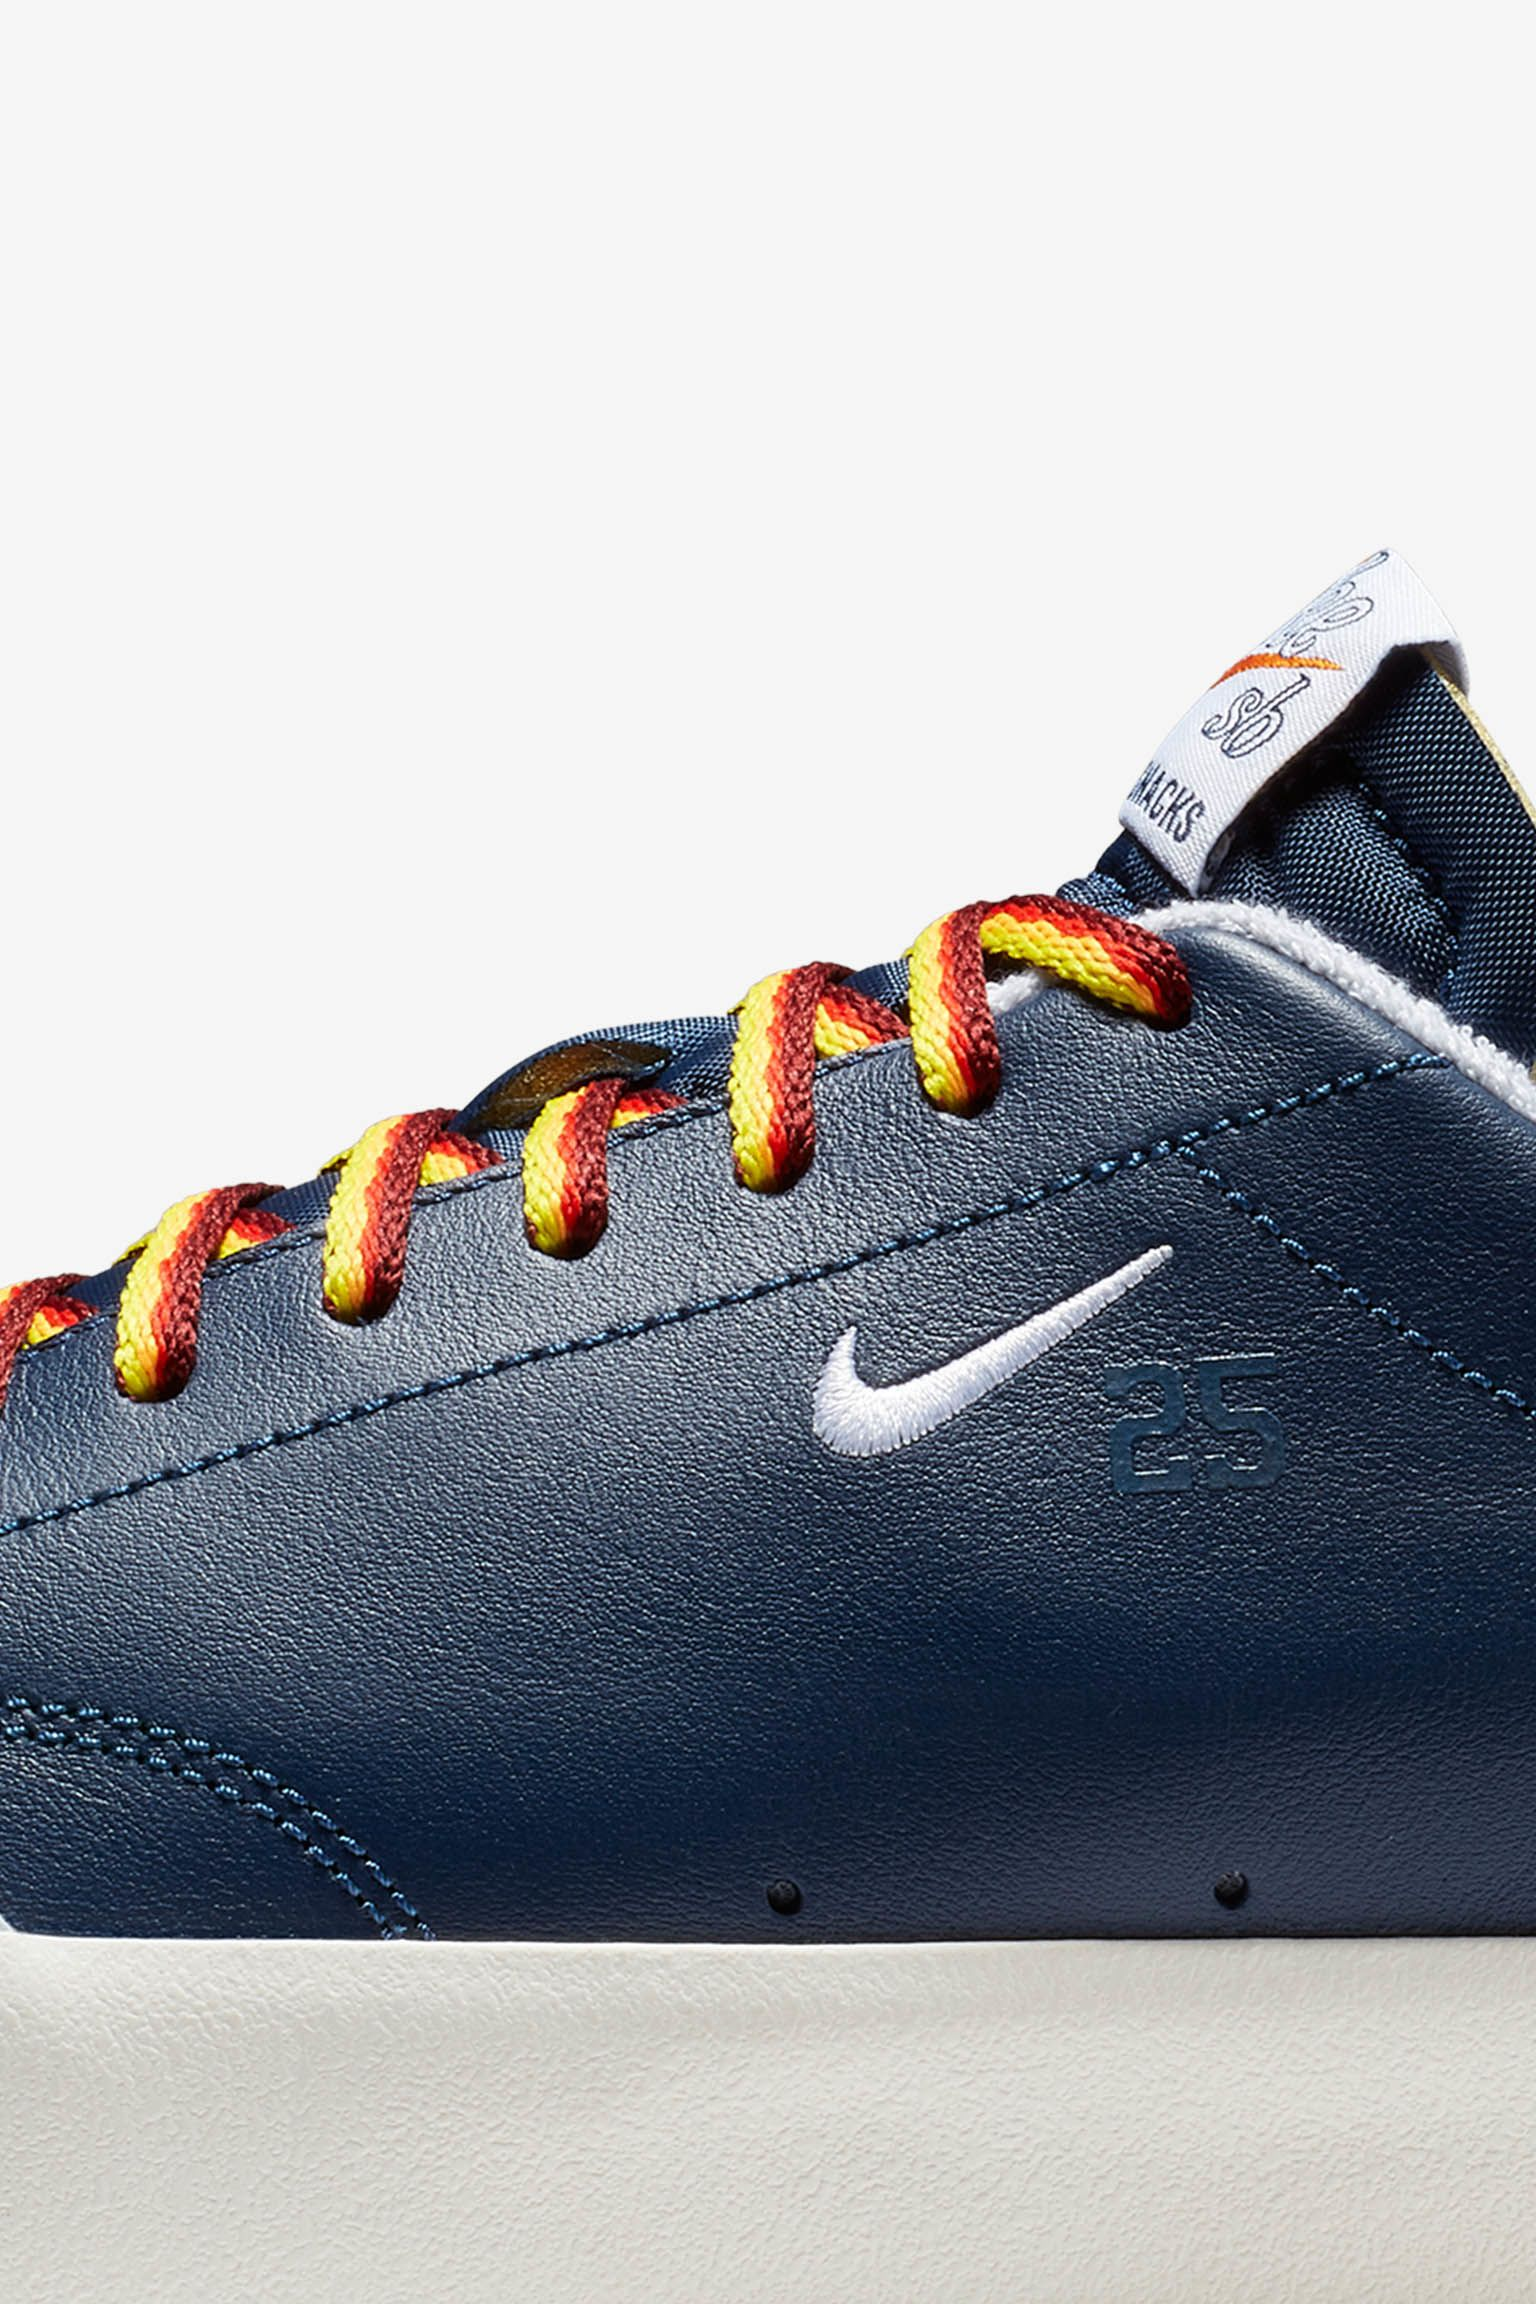 Nike SB Zoom Blazer Low Quartersnacks 'Navy & White' 发布日期